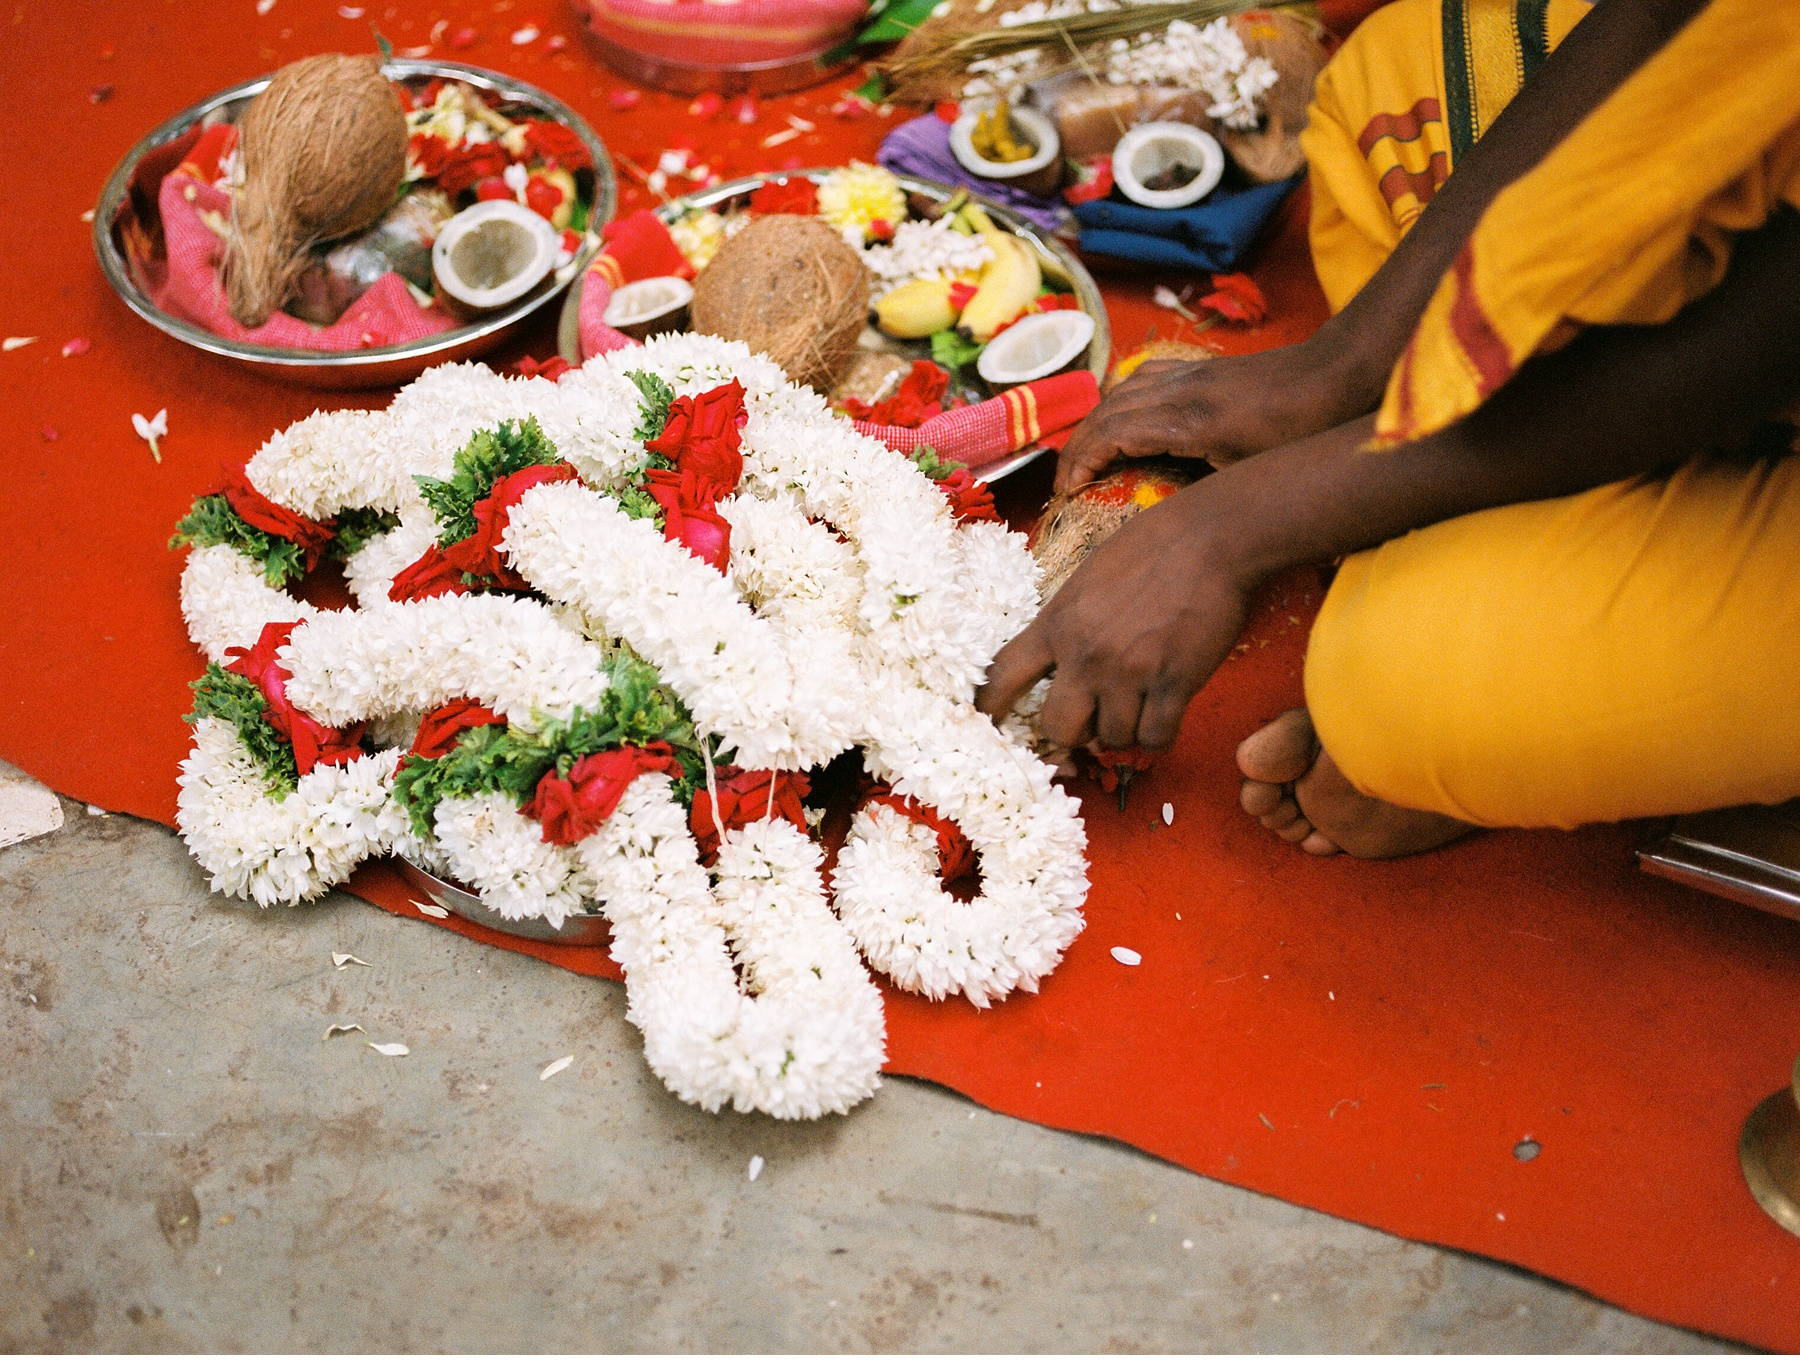 Southern_India_Wedding_Ceremony_0005.jpg